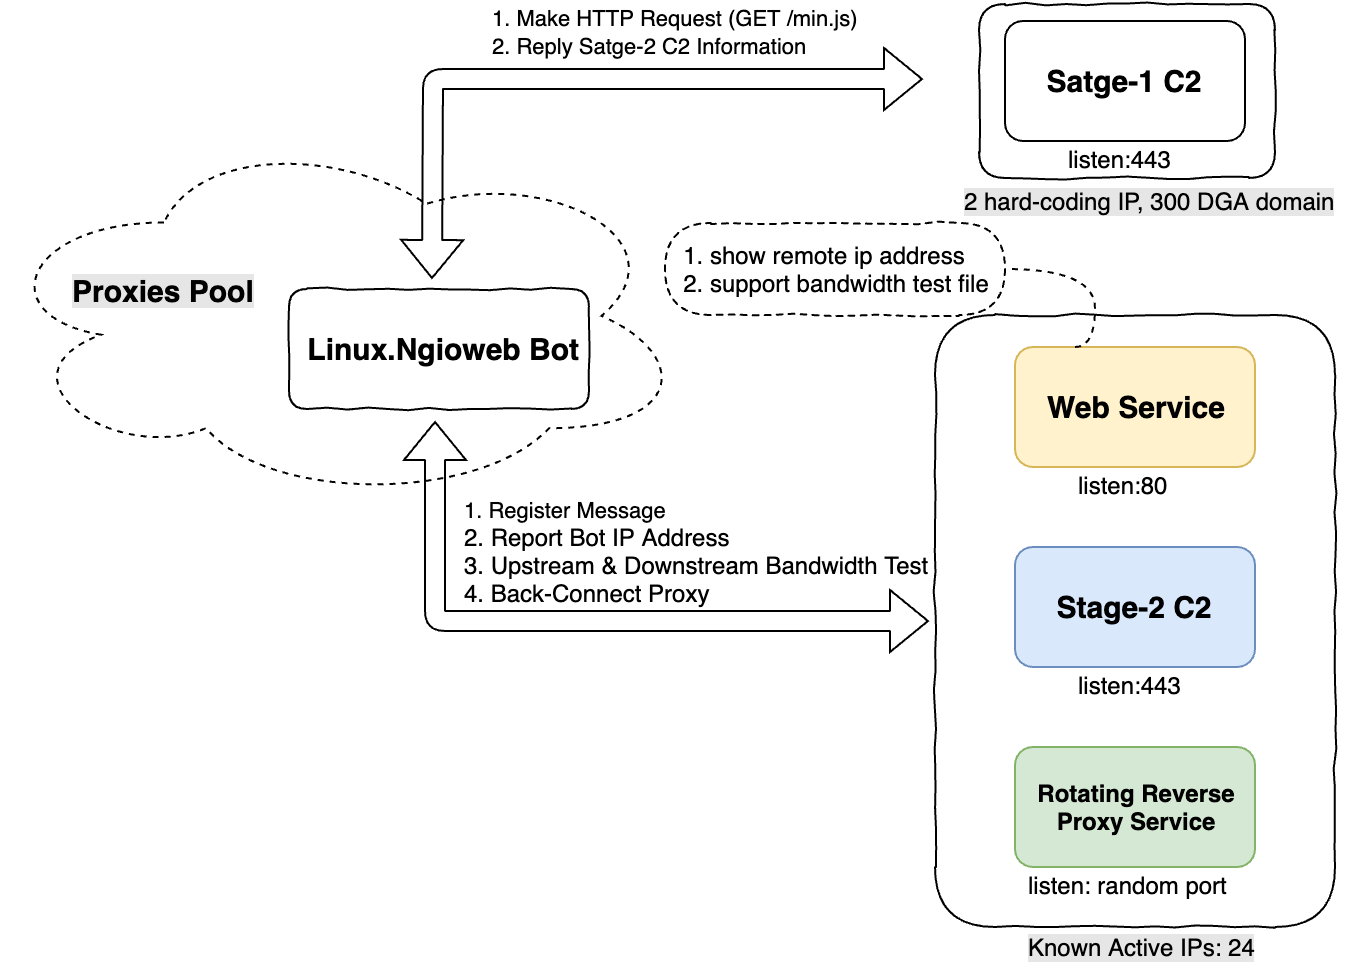 An Analysis of Linux Ngioweb Botnet